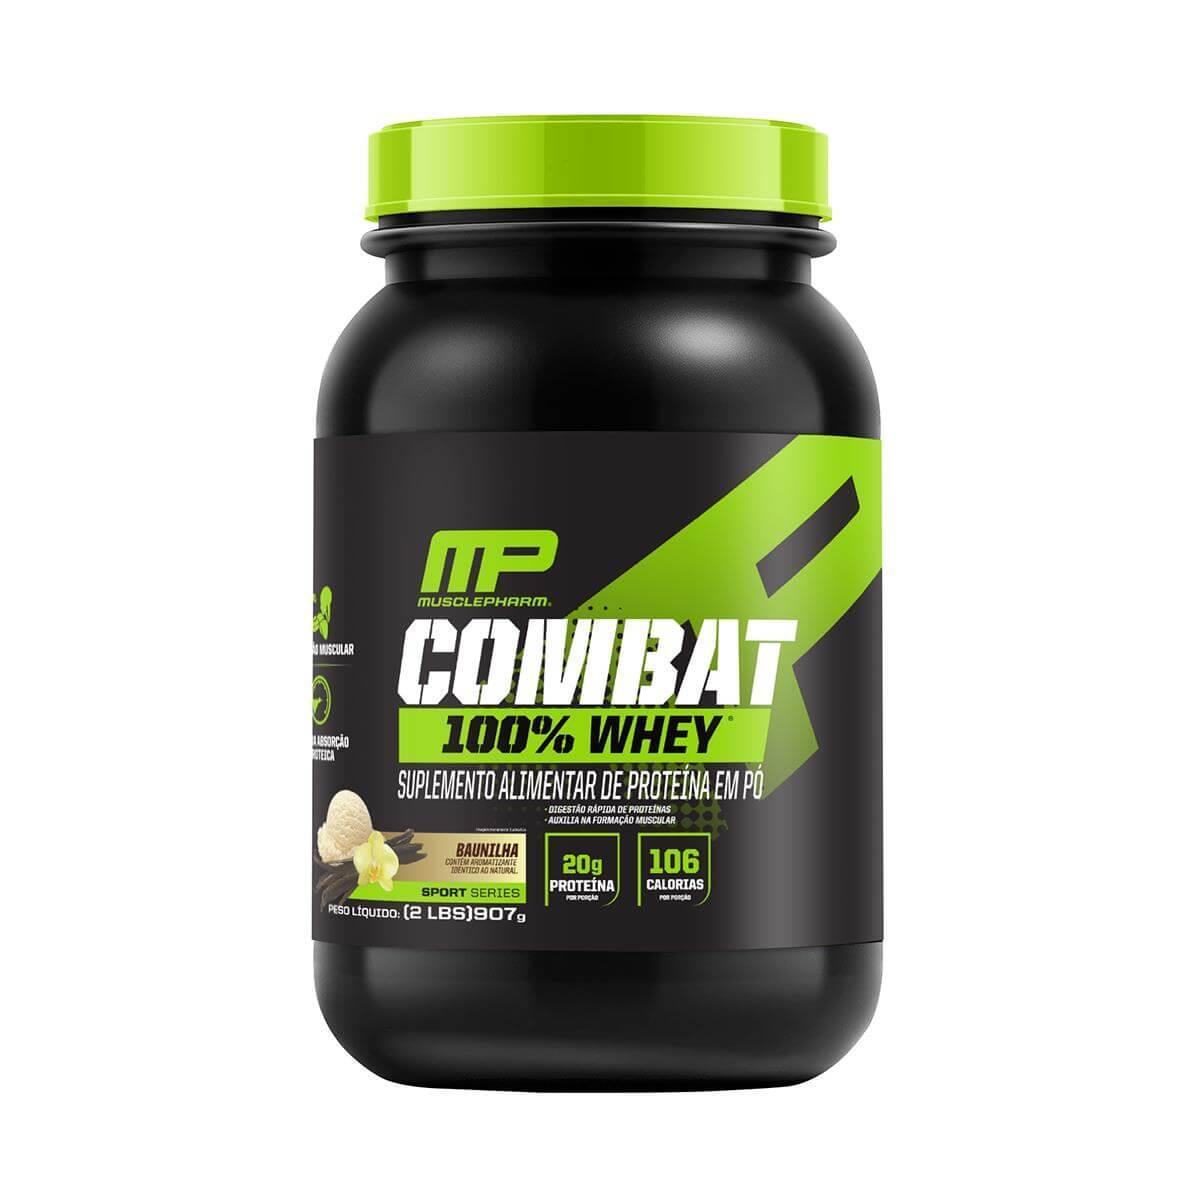 COMBAT 100% WHEY (907g) - Baunilha - Muscle Pharm